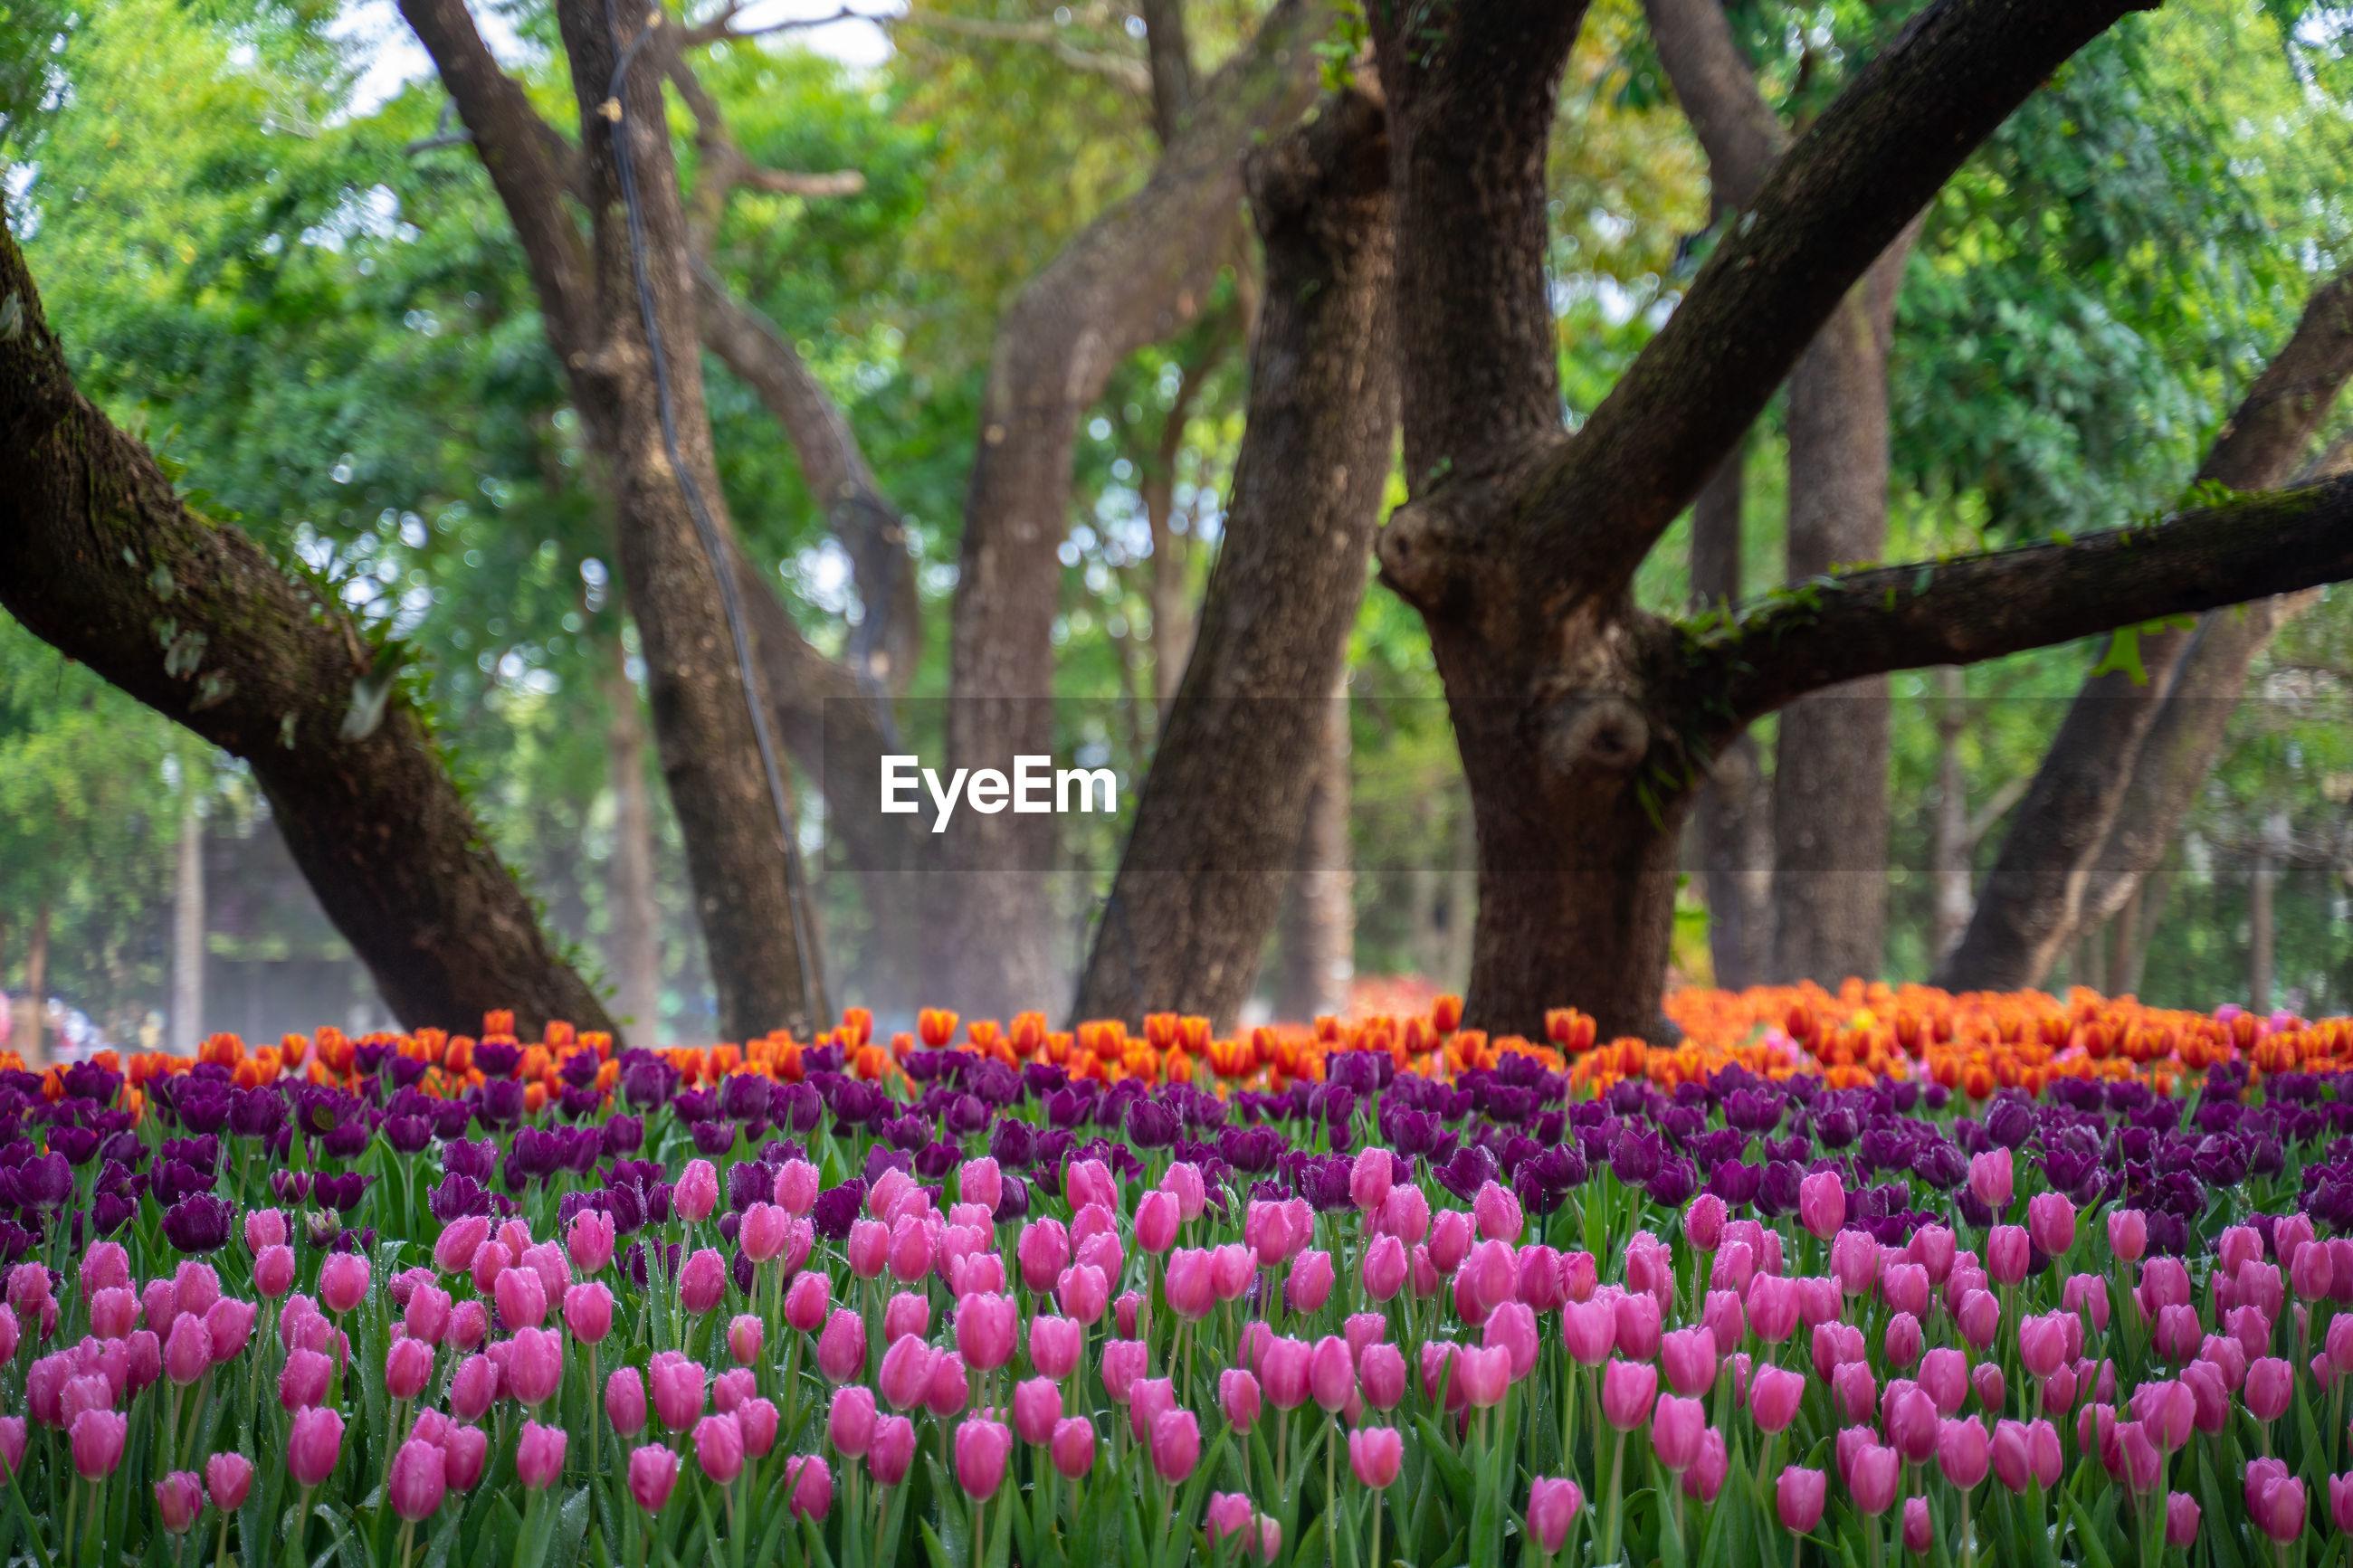 FRESH PINK FLOWERS IN PARK